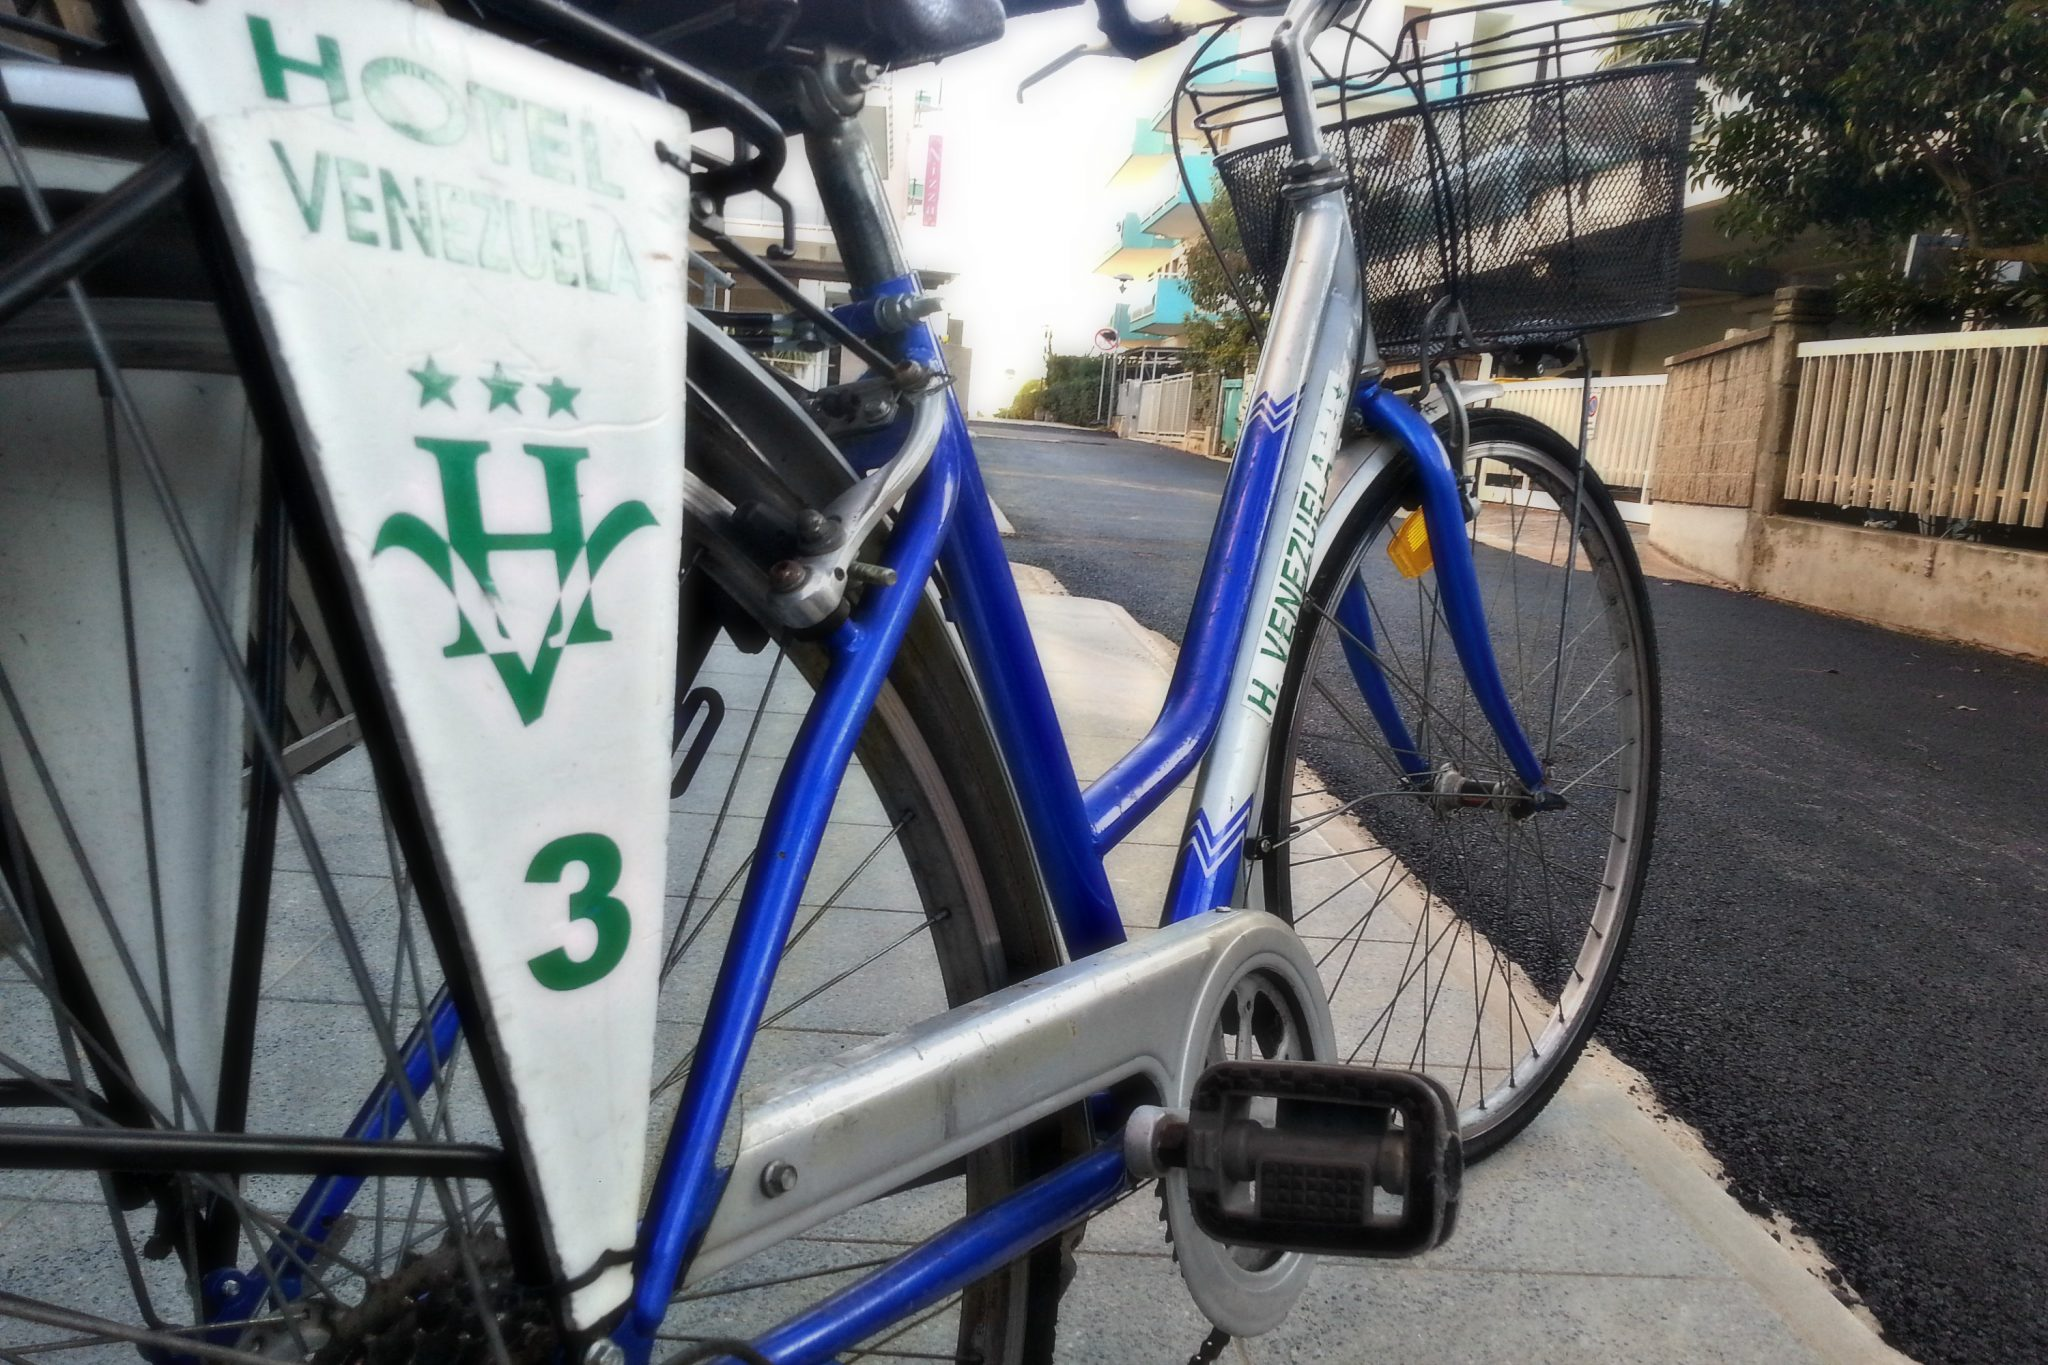 http://www.hotelvenezuela.it/wp-content/uploads/2016/05/bicicletta6.jpeg